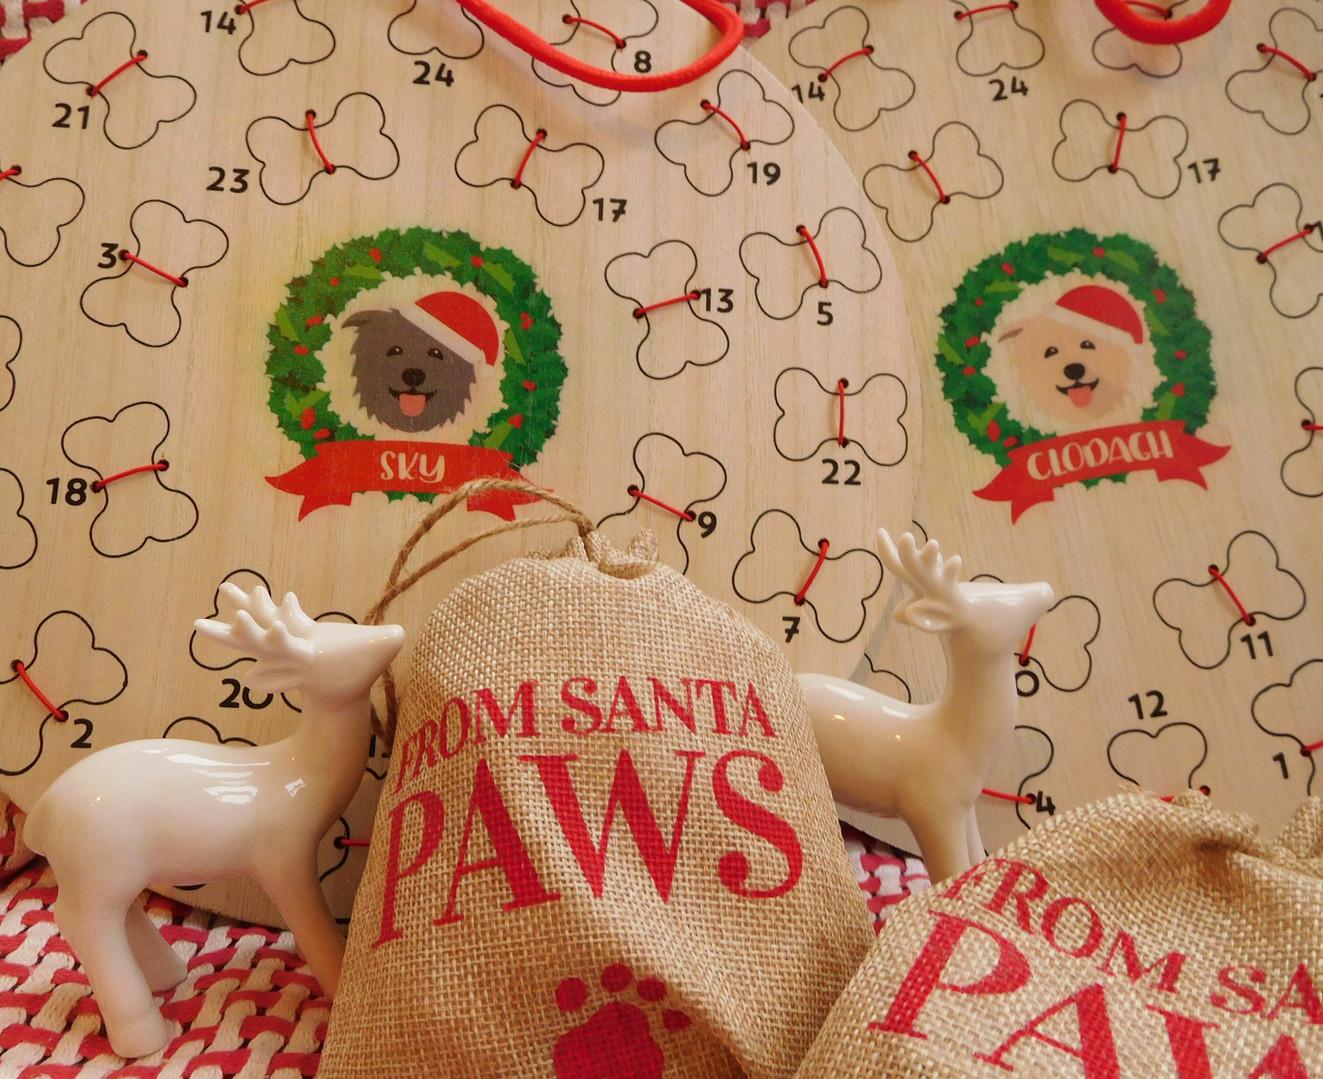 🎅🎄🐾 Santa Paws 🐾🎄🎅